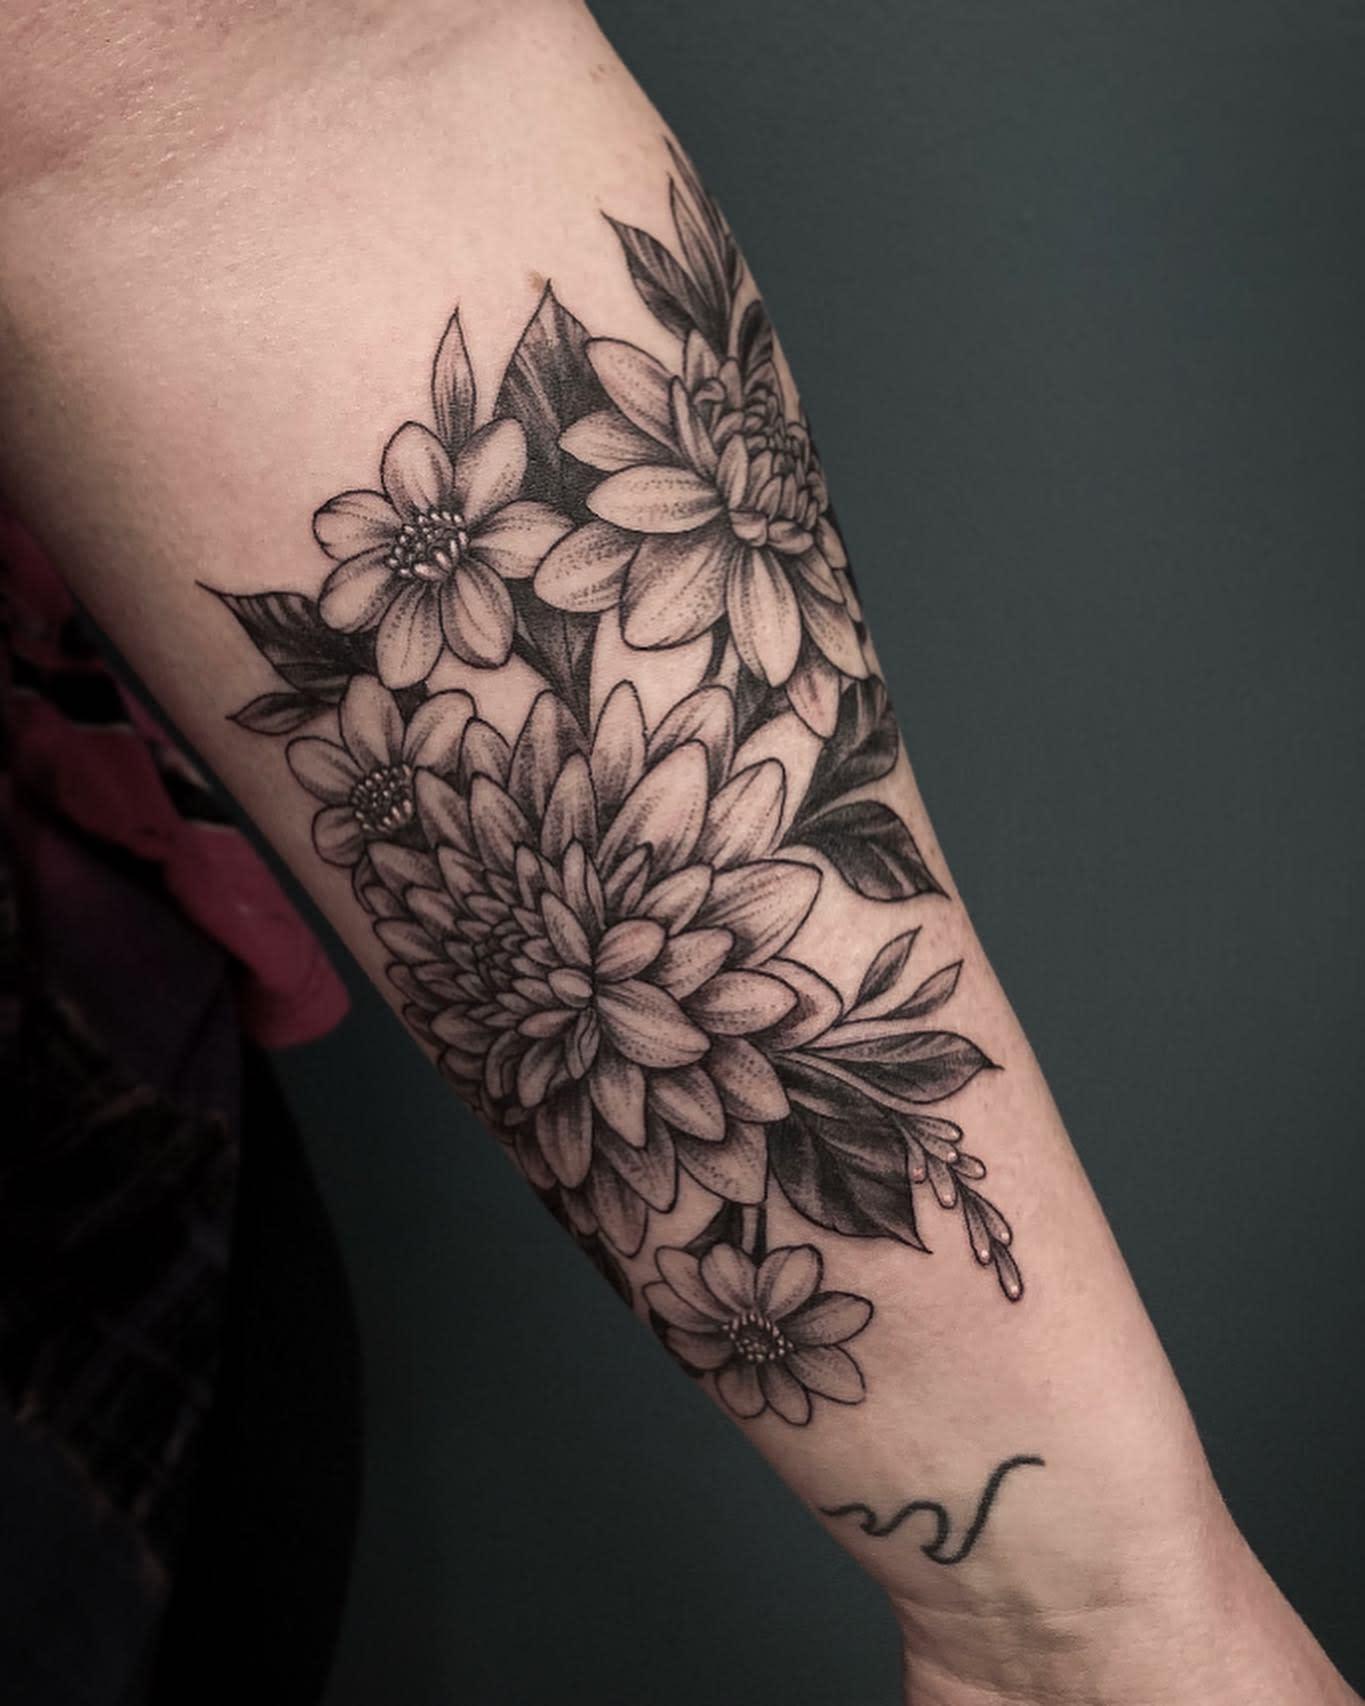 Dahlia Forearm Tattoo -kayseeshuster